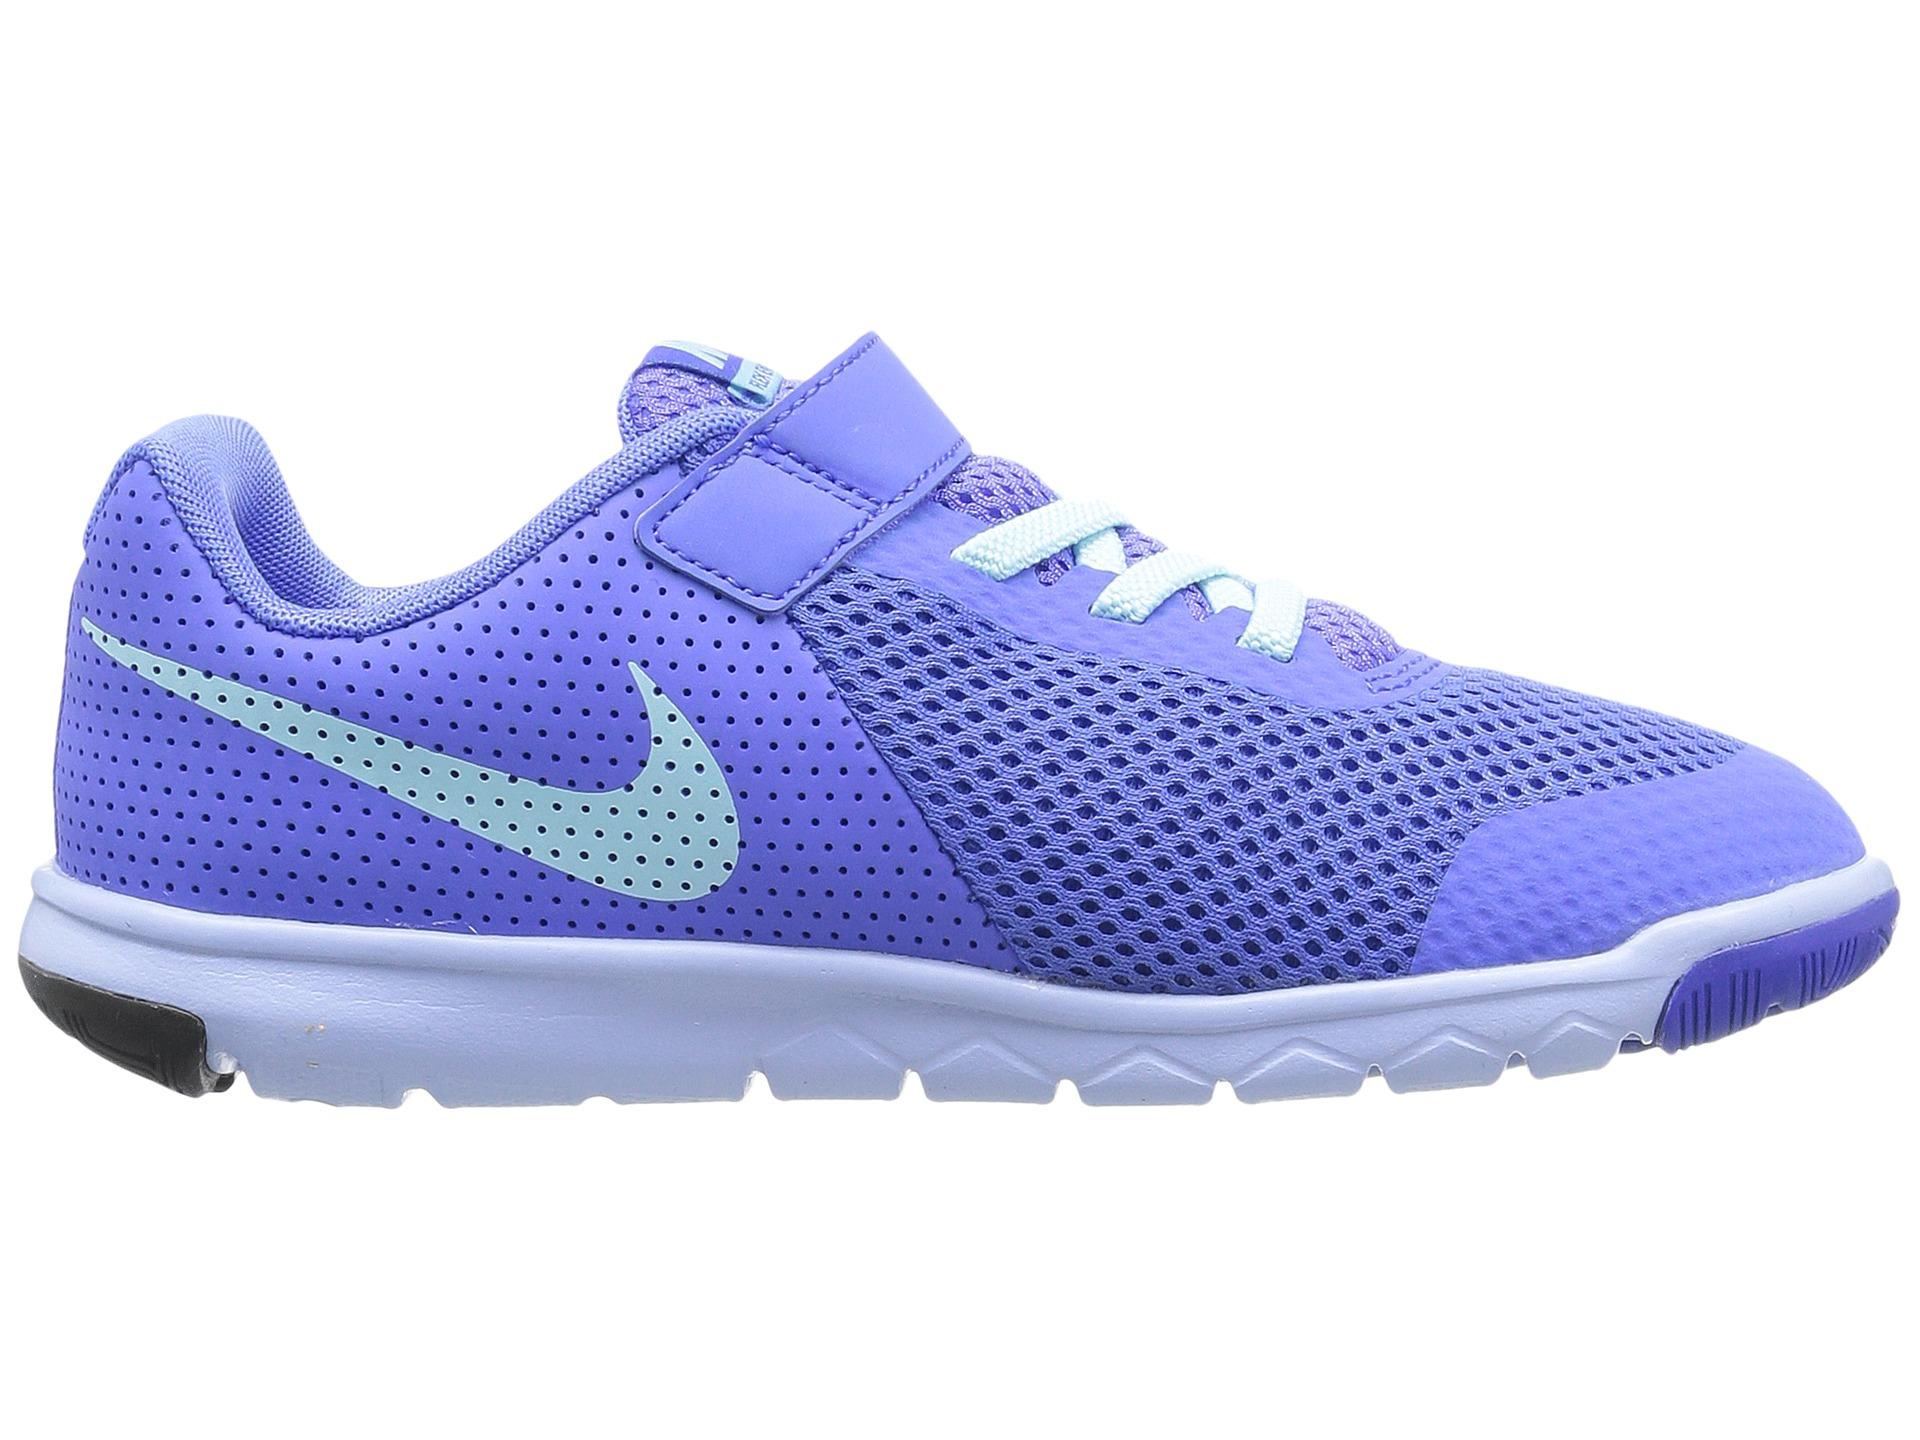 e68830604942d Nike Epic React Flyknit Biggo